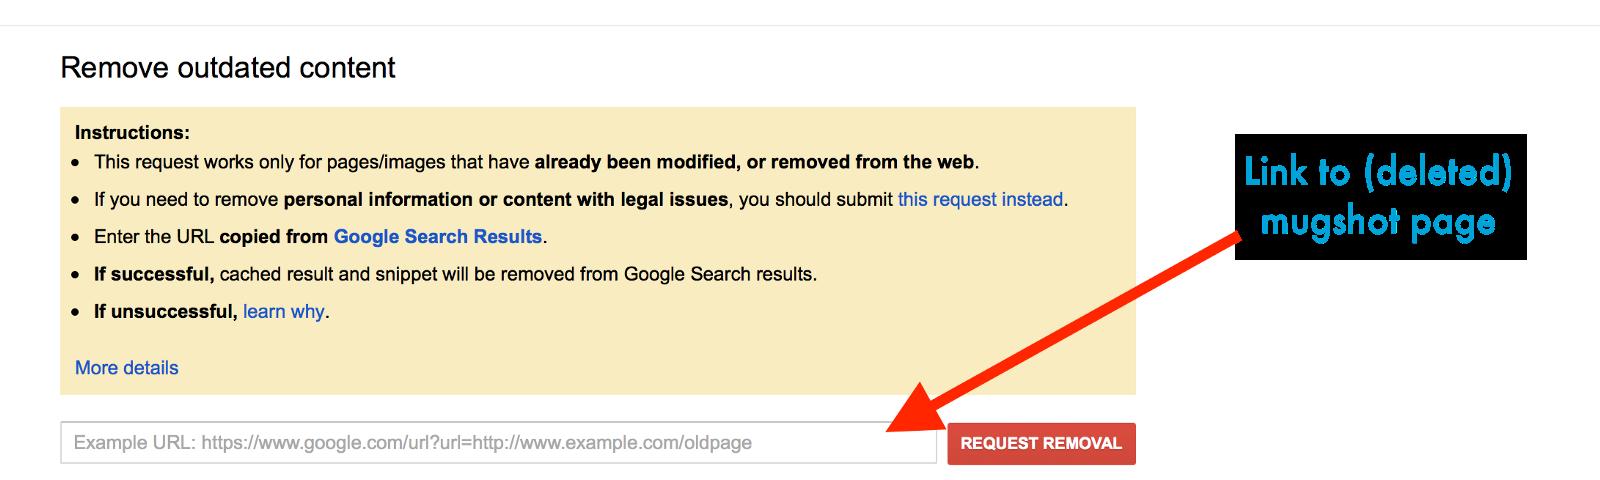 Deindex Mugshot Links on Google Search - How to Erase